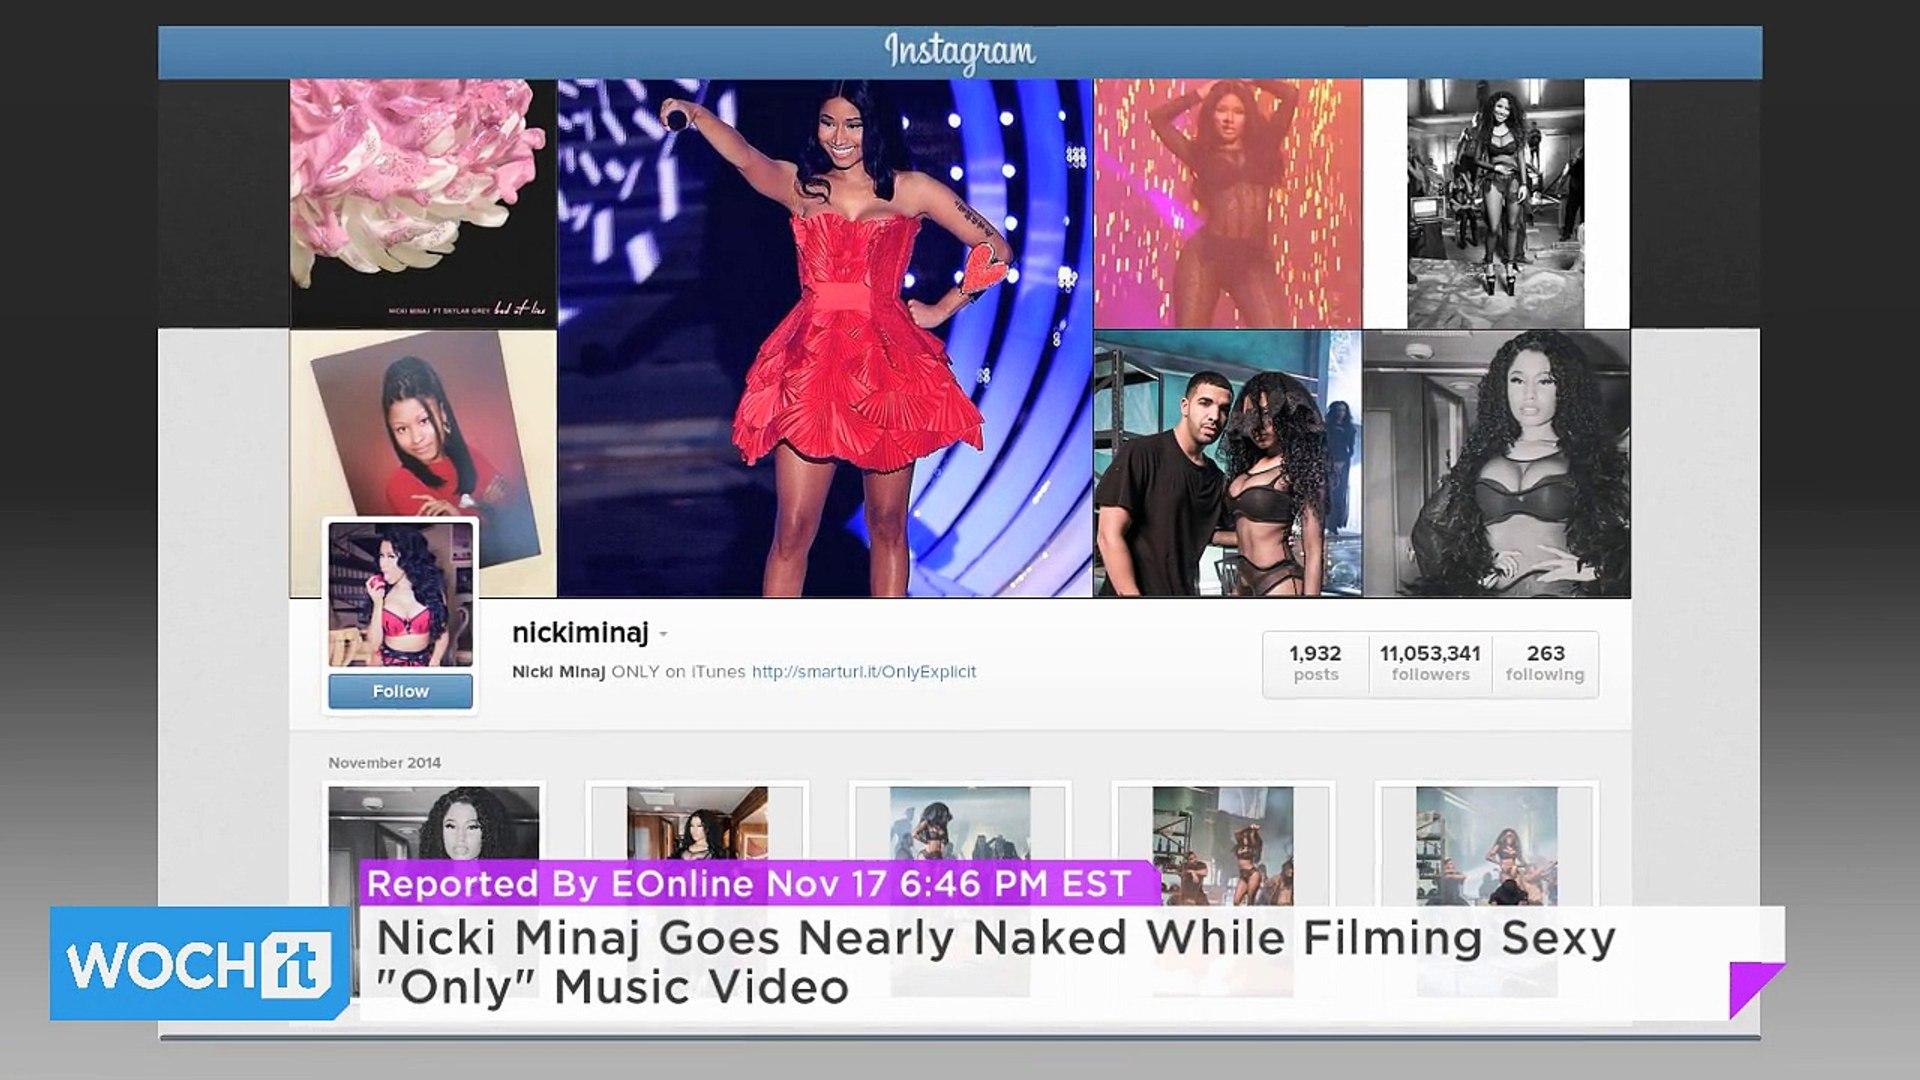 Nicki Minaj Goes Nearly Naked While Filming Sexy